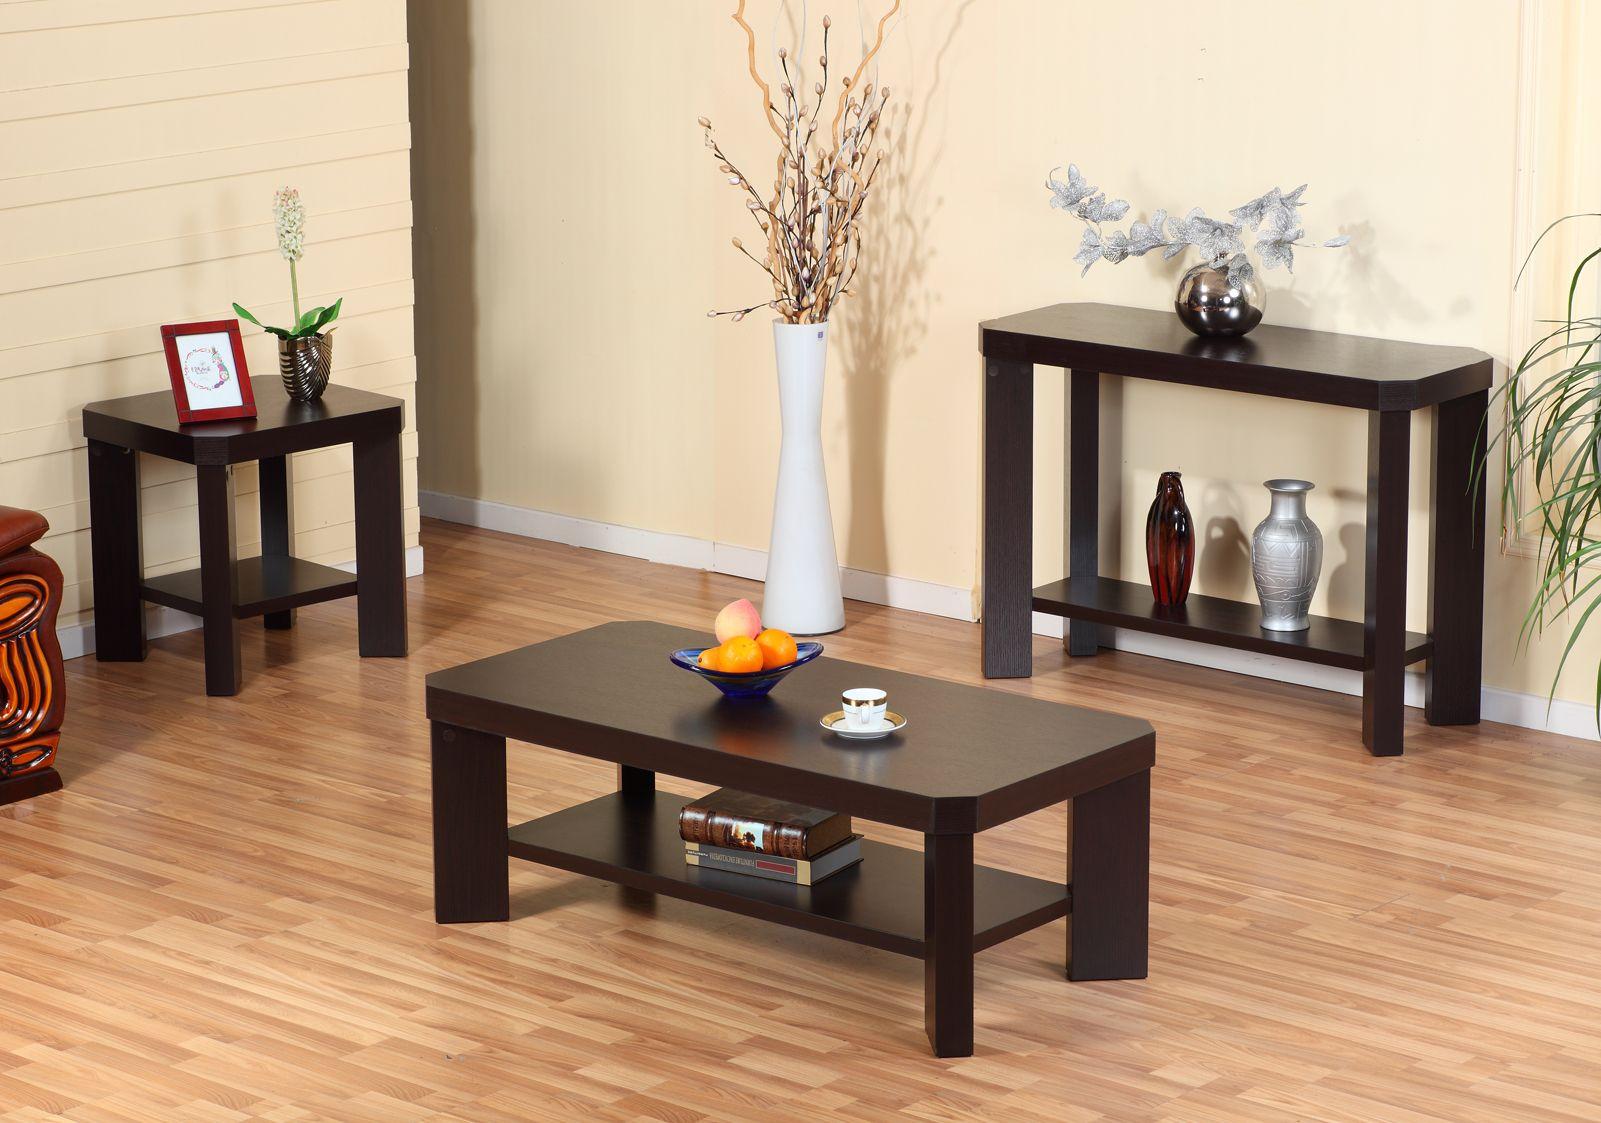 Wonderful Storage · ID USA Furniture Distributor No. 13691 X2 Coffee Setu0027s Extra  Chunky Legs Add Simplistic Design Inspirations